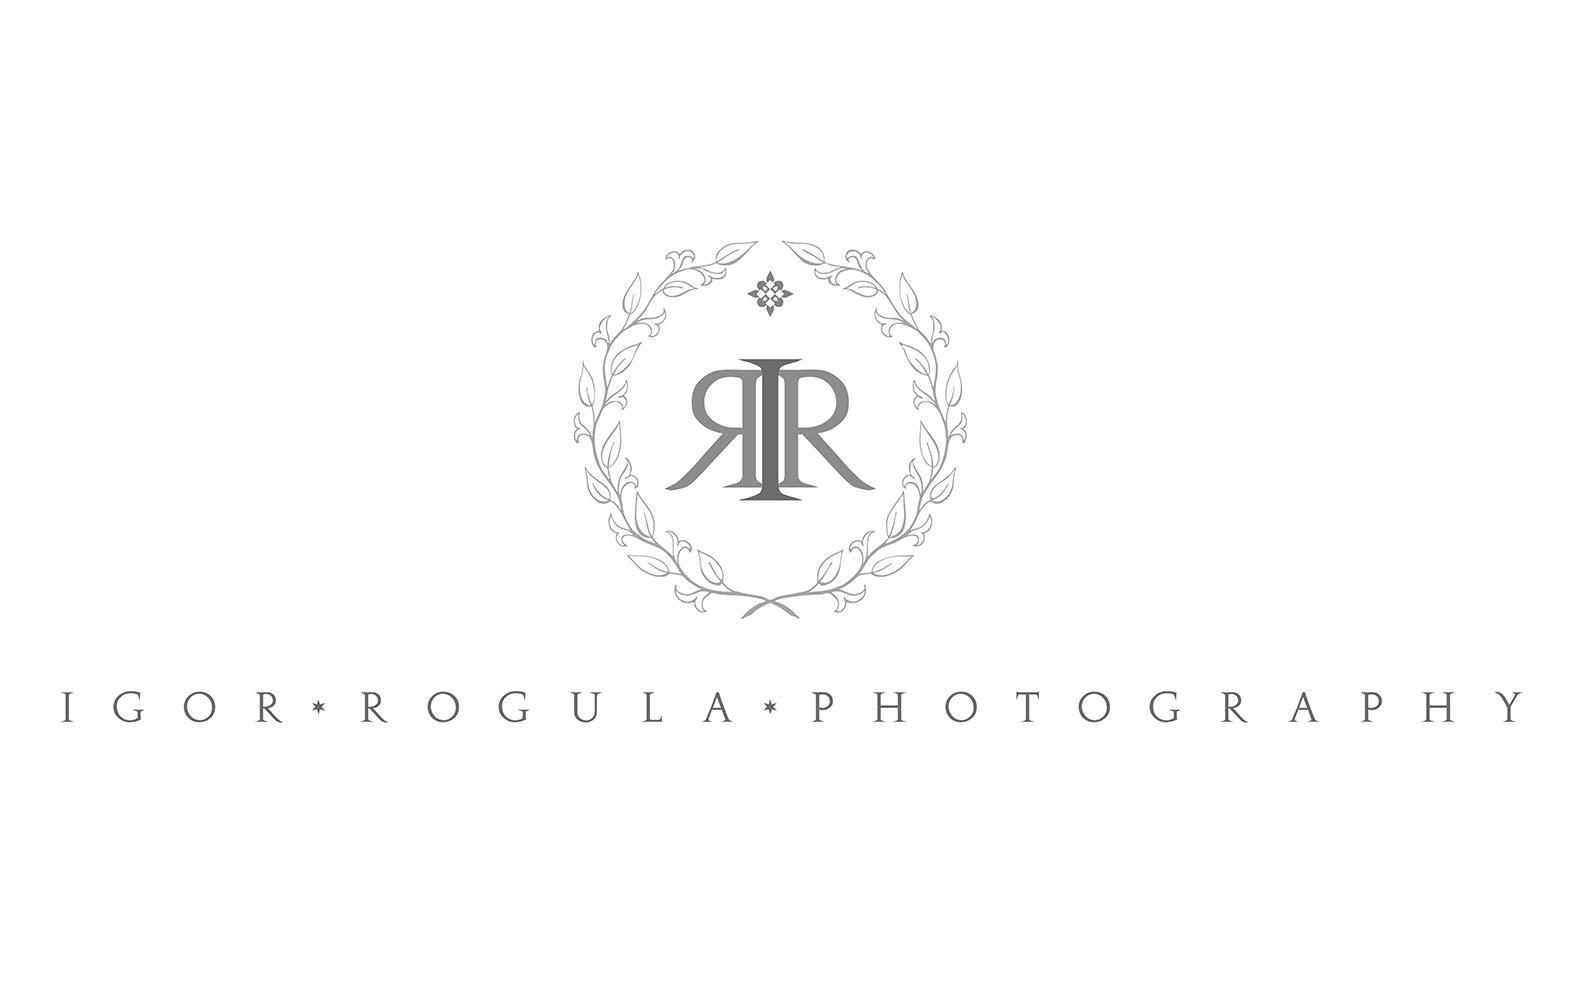 Igor Rogula